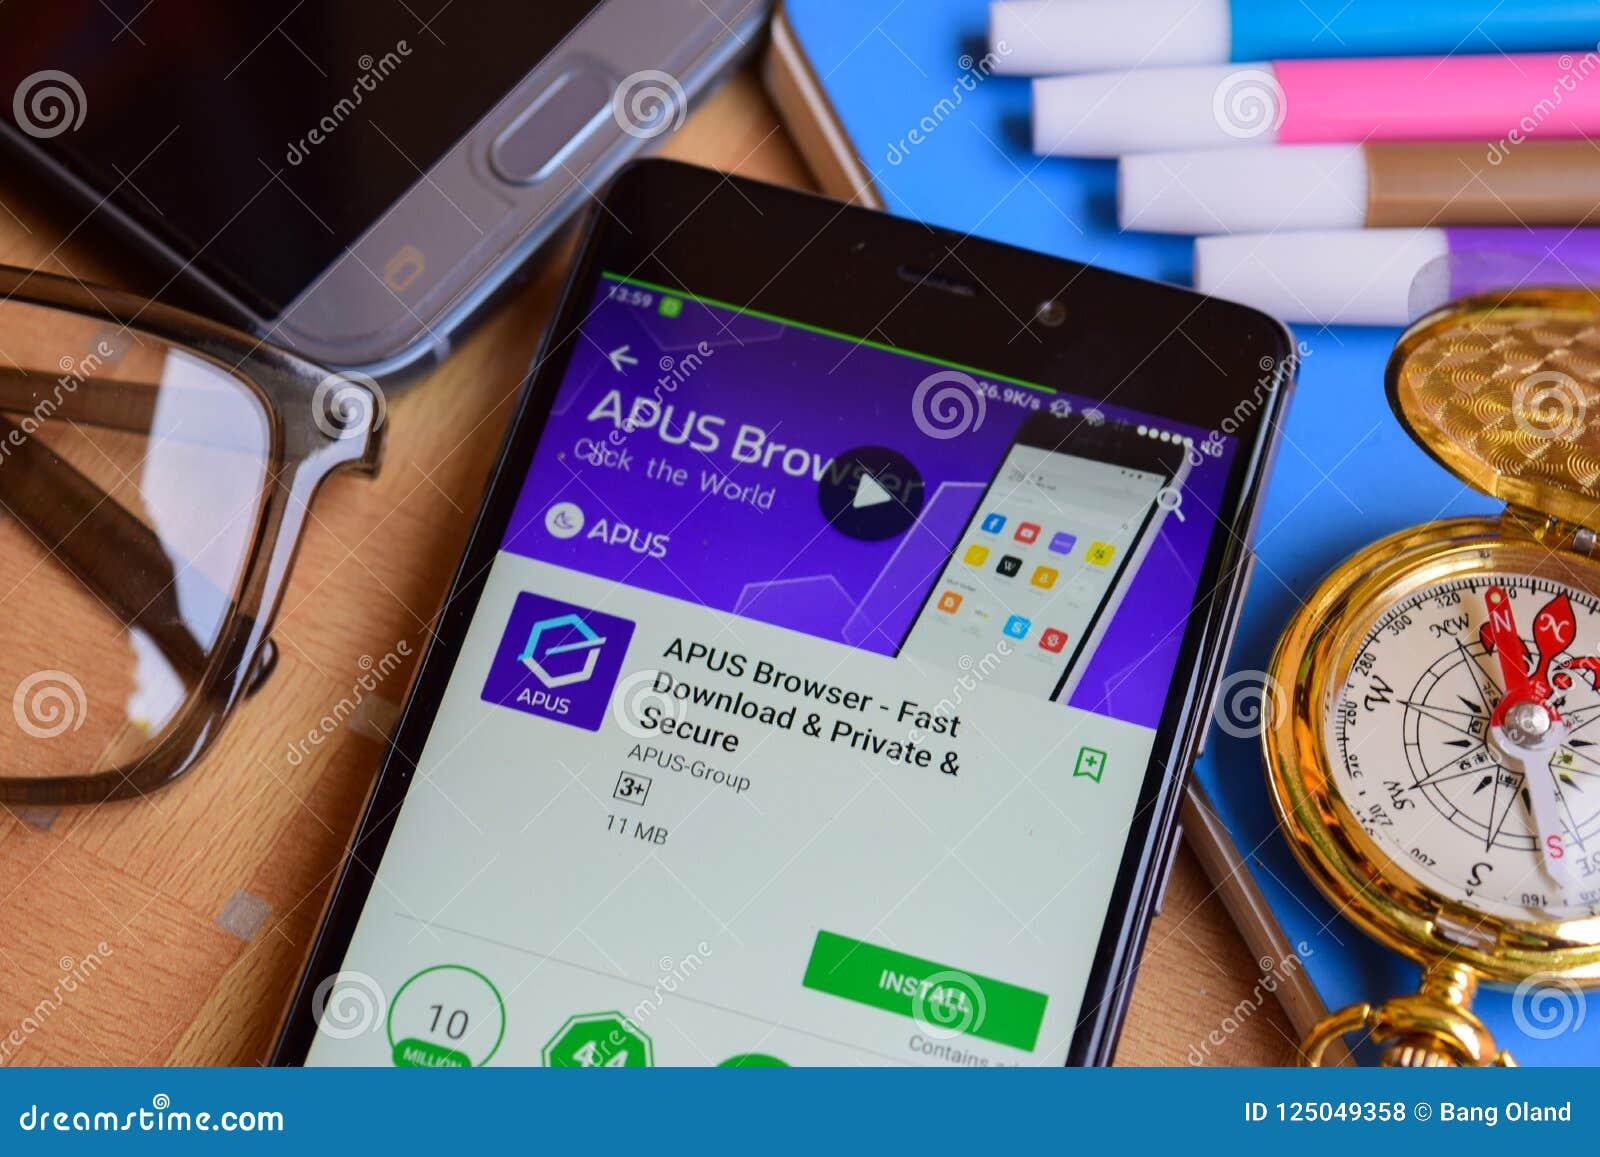 APUS Browser -Fast Download & Private & Secure Dev App On Smartphone